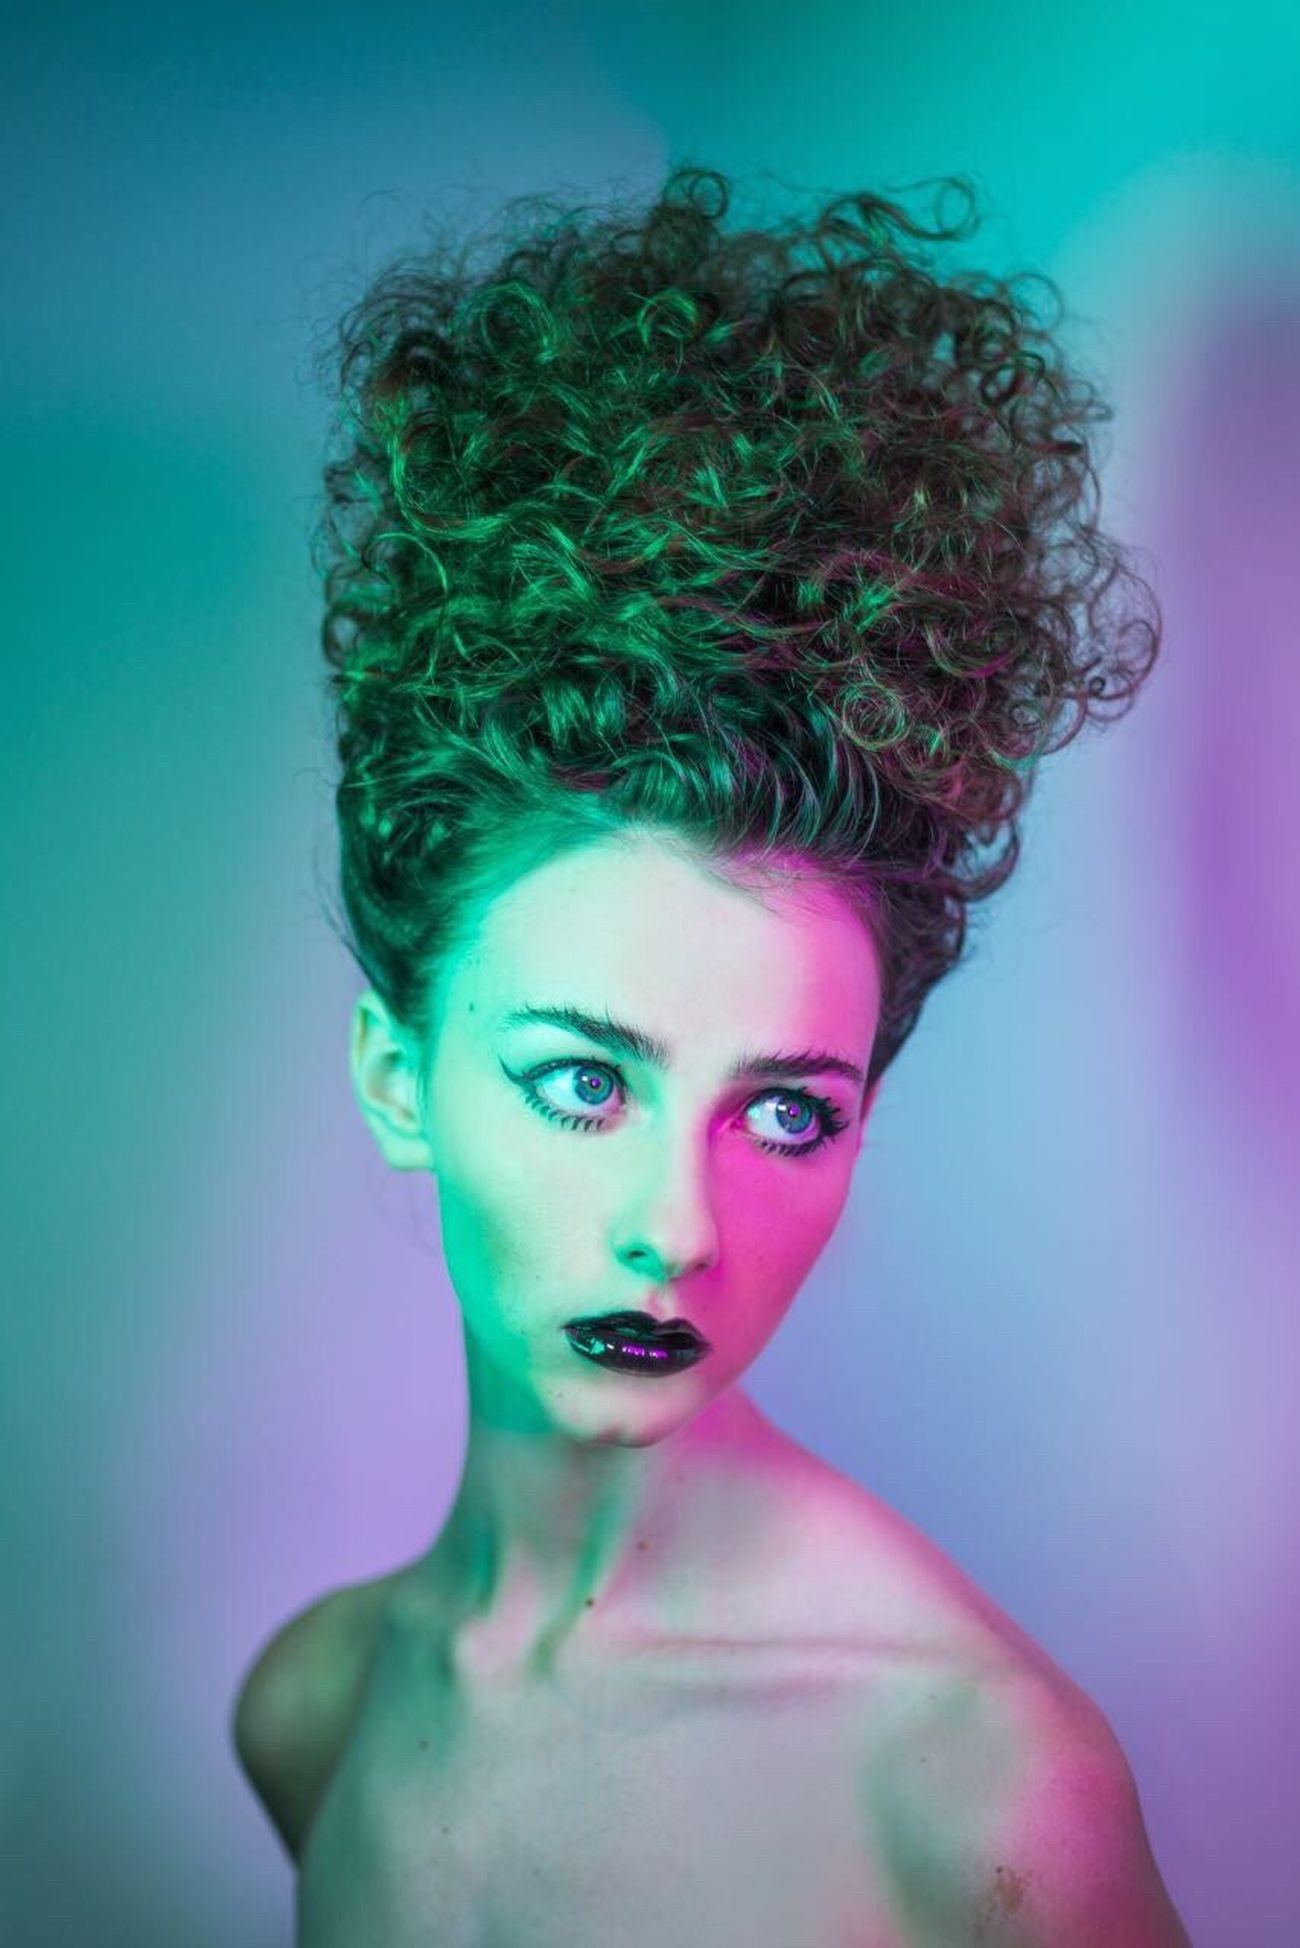 Studio Shot Portrait Fashion Only Women Beautiful Woman Make-up Young Women Curly Hair This Week On Eyeem TheWeekOnEyeEM